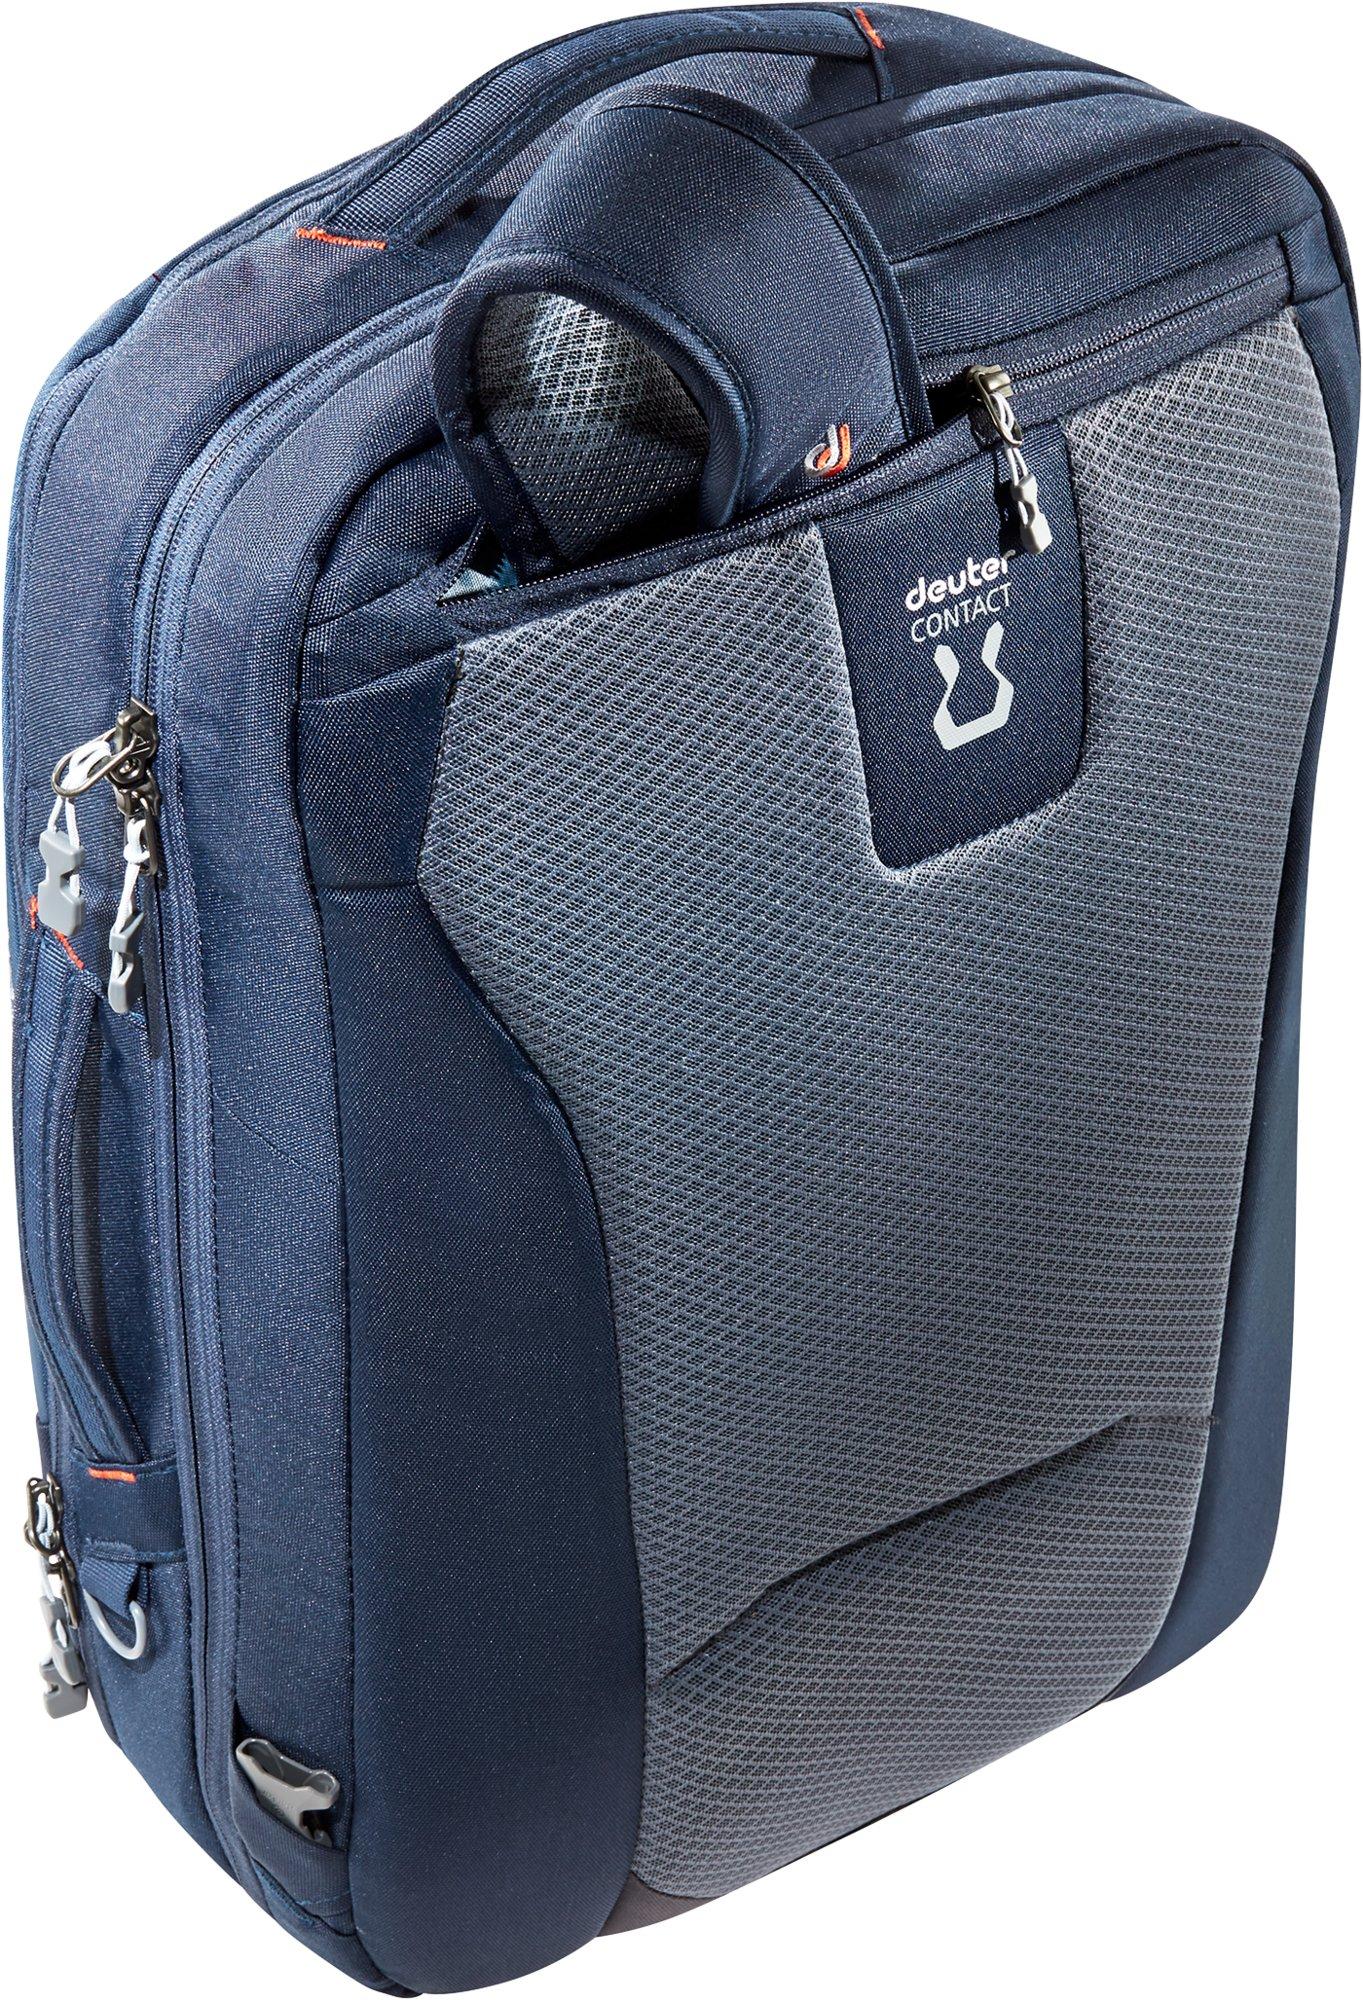 Deuter - AViANT Carry On 28, Reisetasche